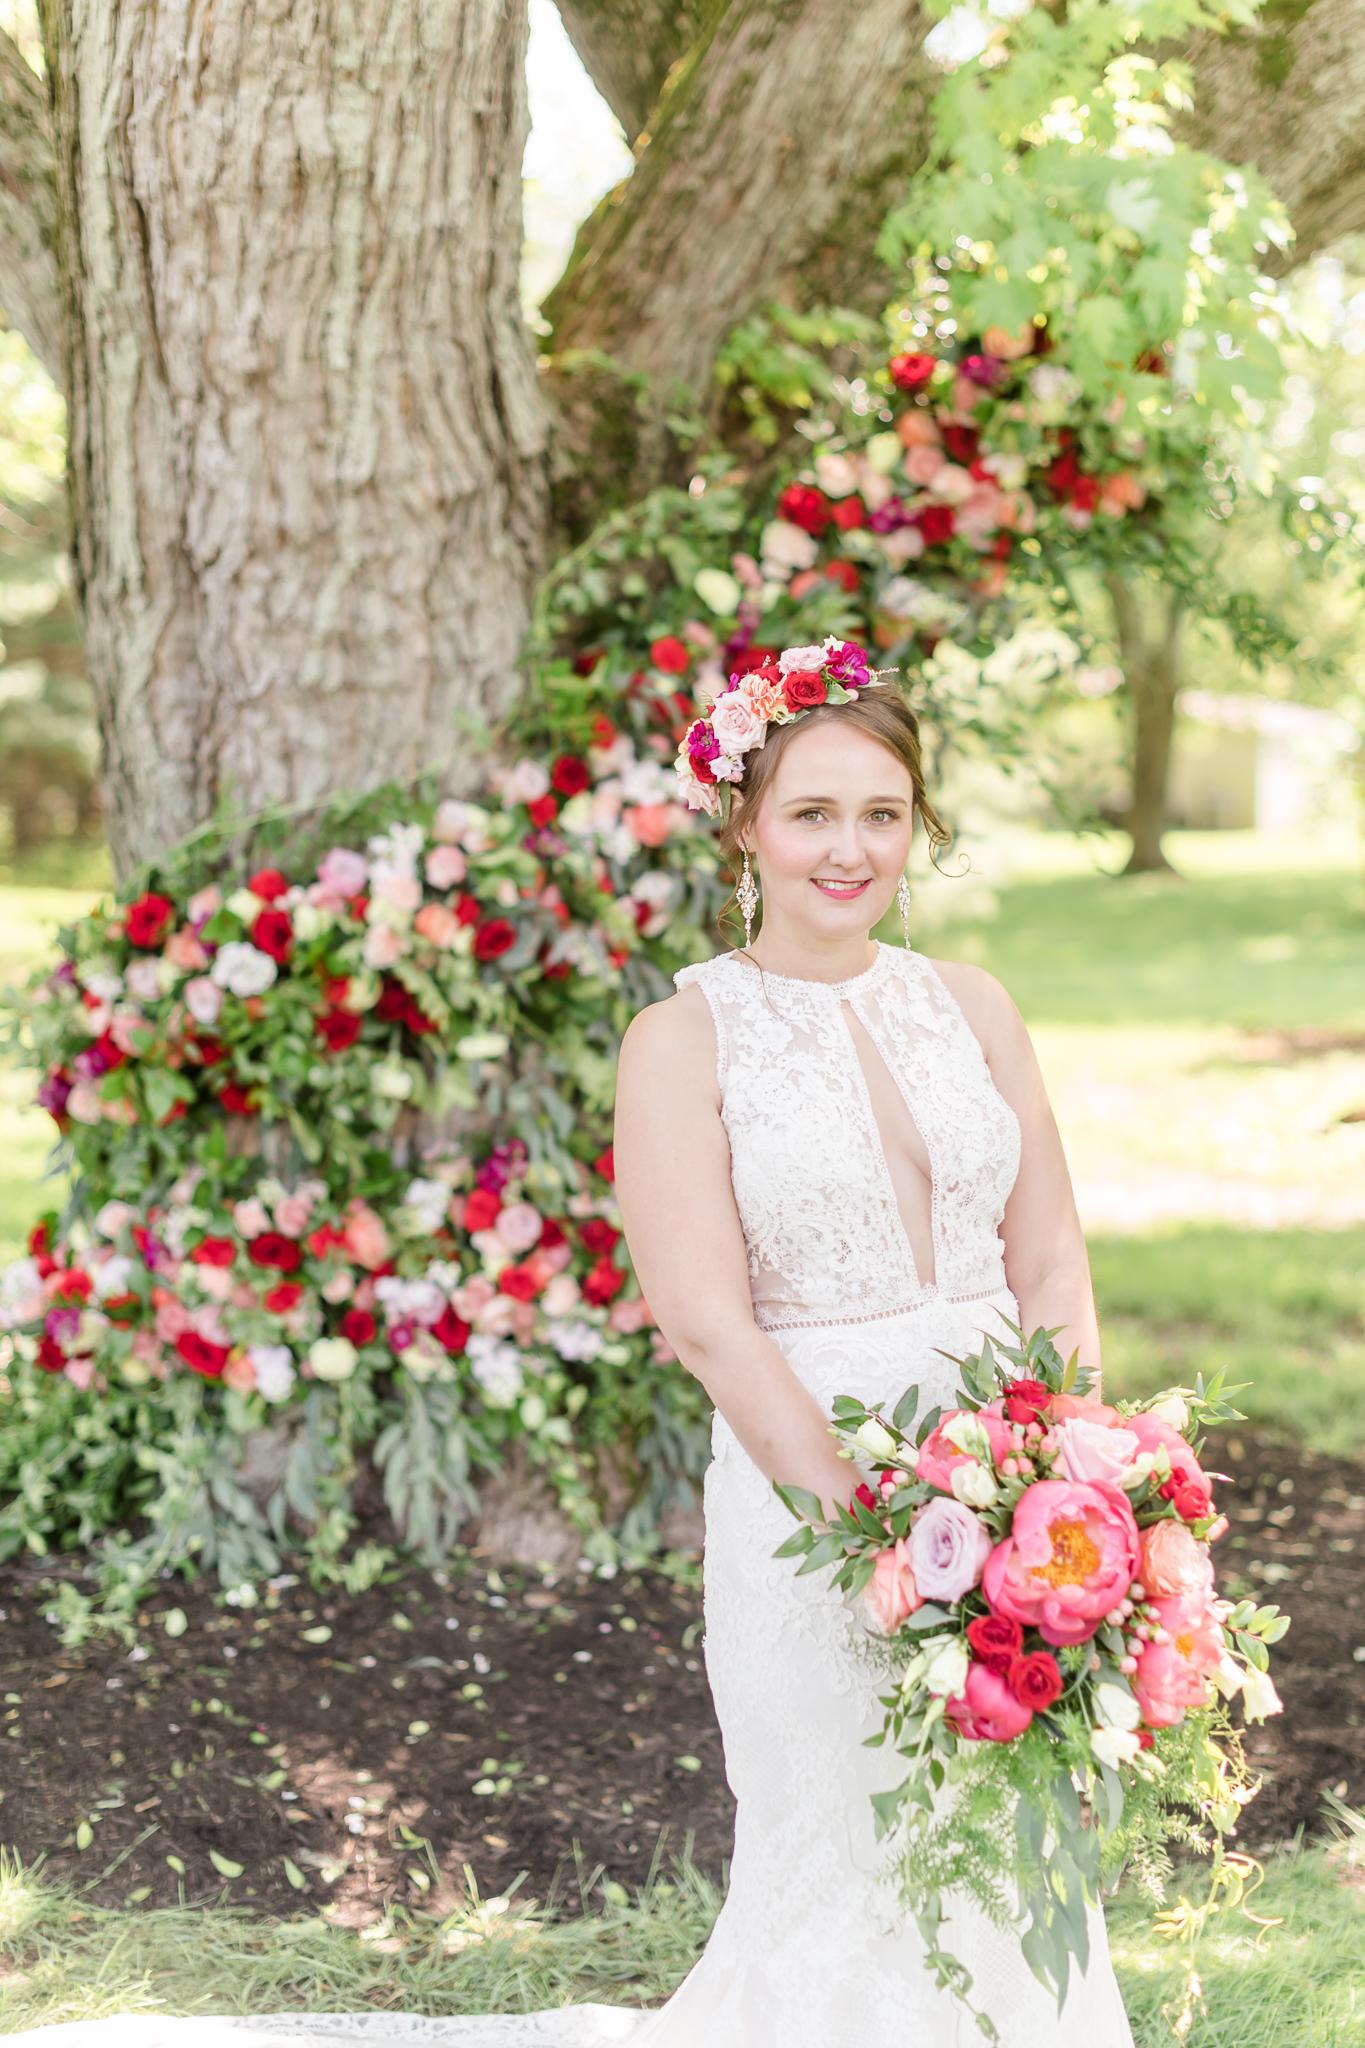 Mustard Seed Gardens Wedding Indianapolis Noblesvile Fishers Wedding Photographer-33.jpg